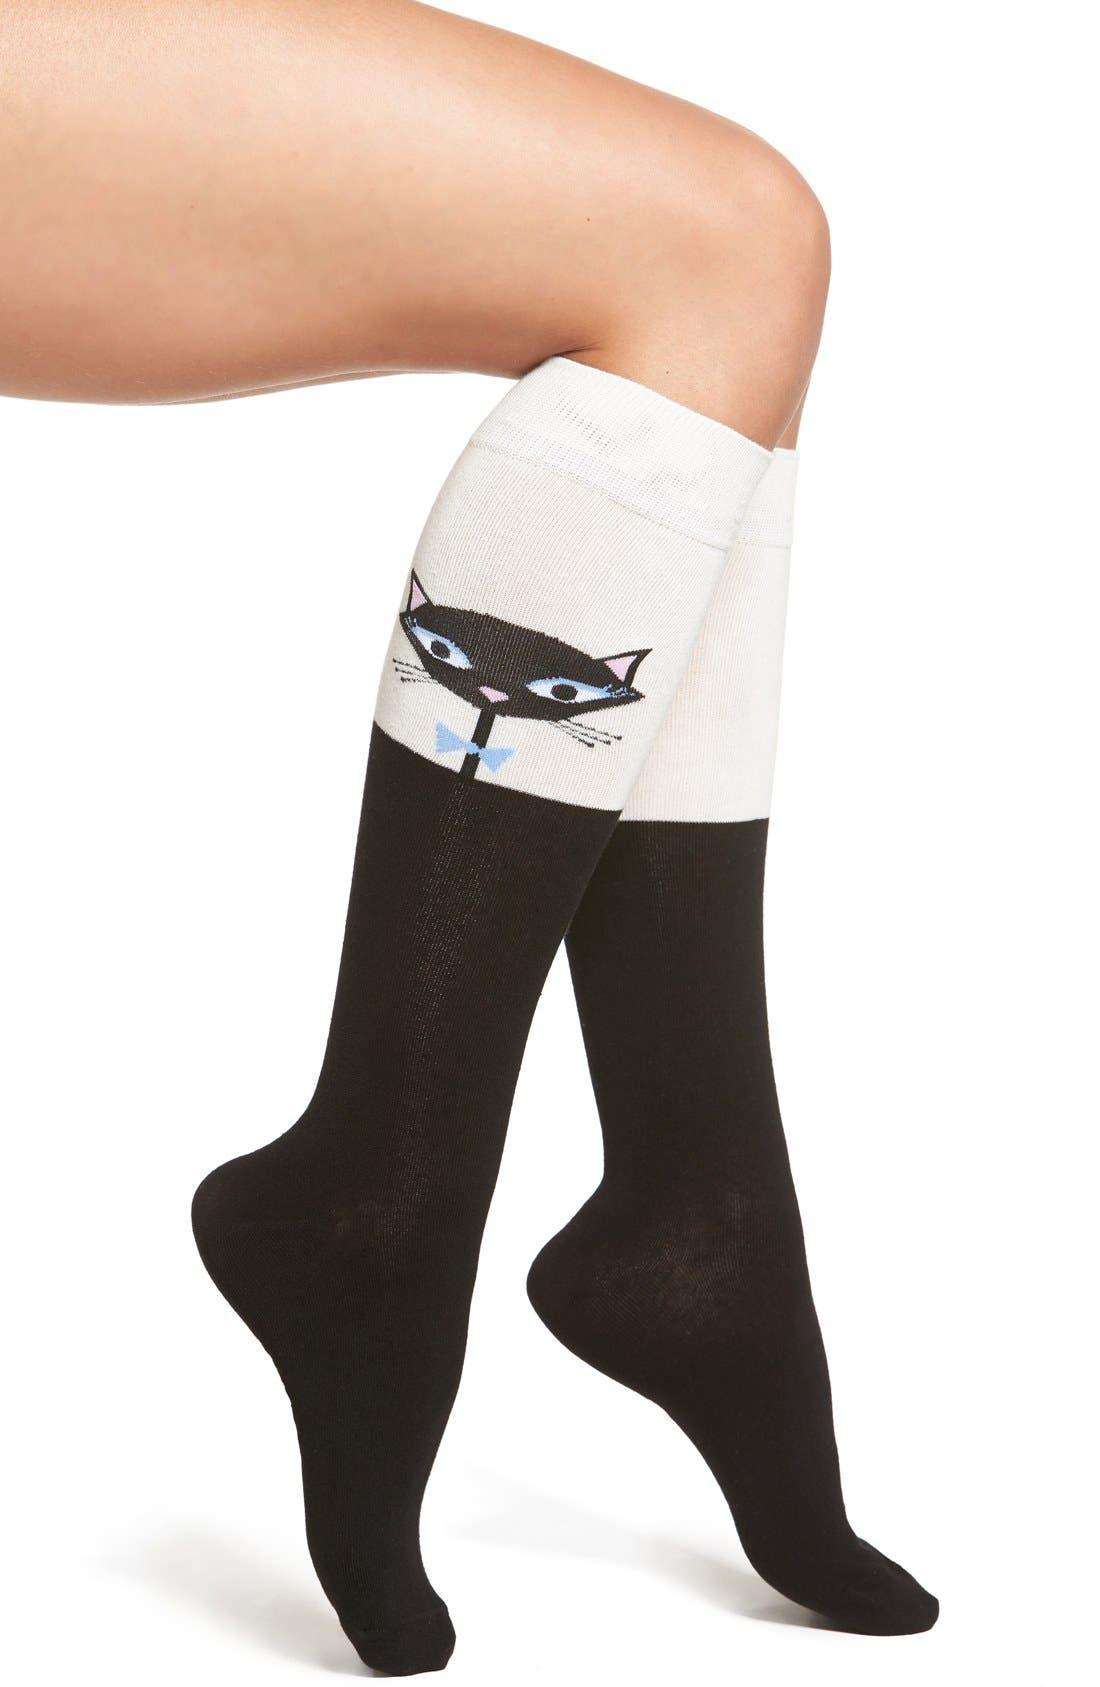 Alternate Image 1 Selected - kate spade new york cool cat knee high socks